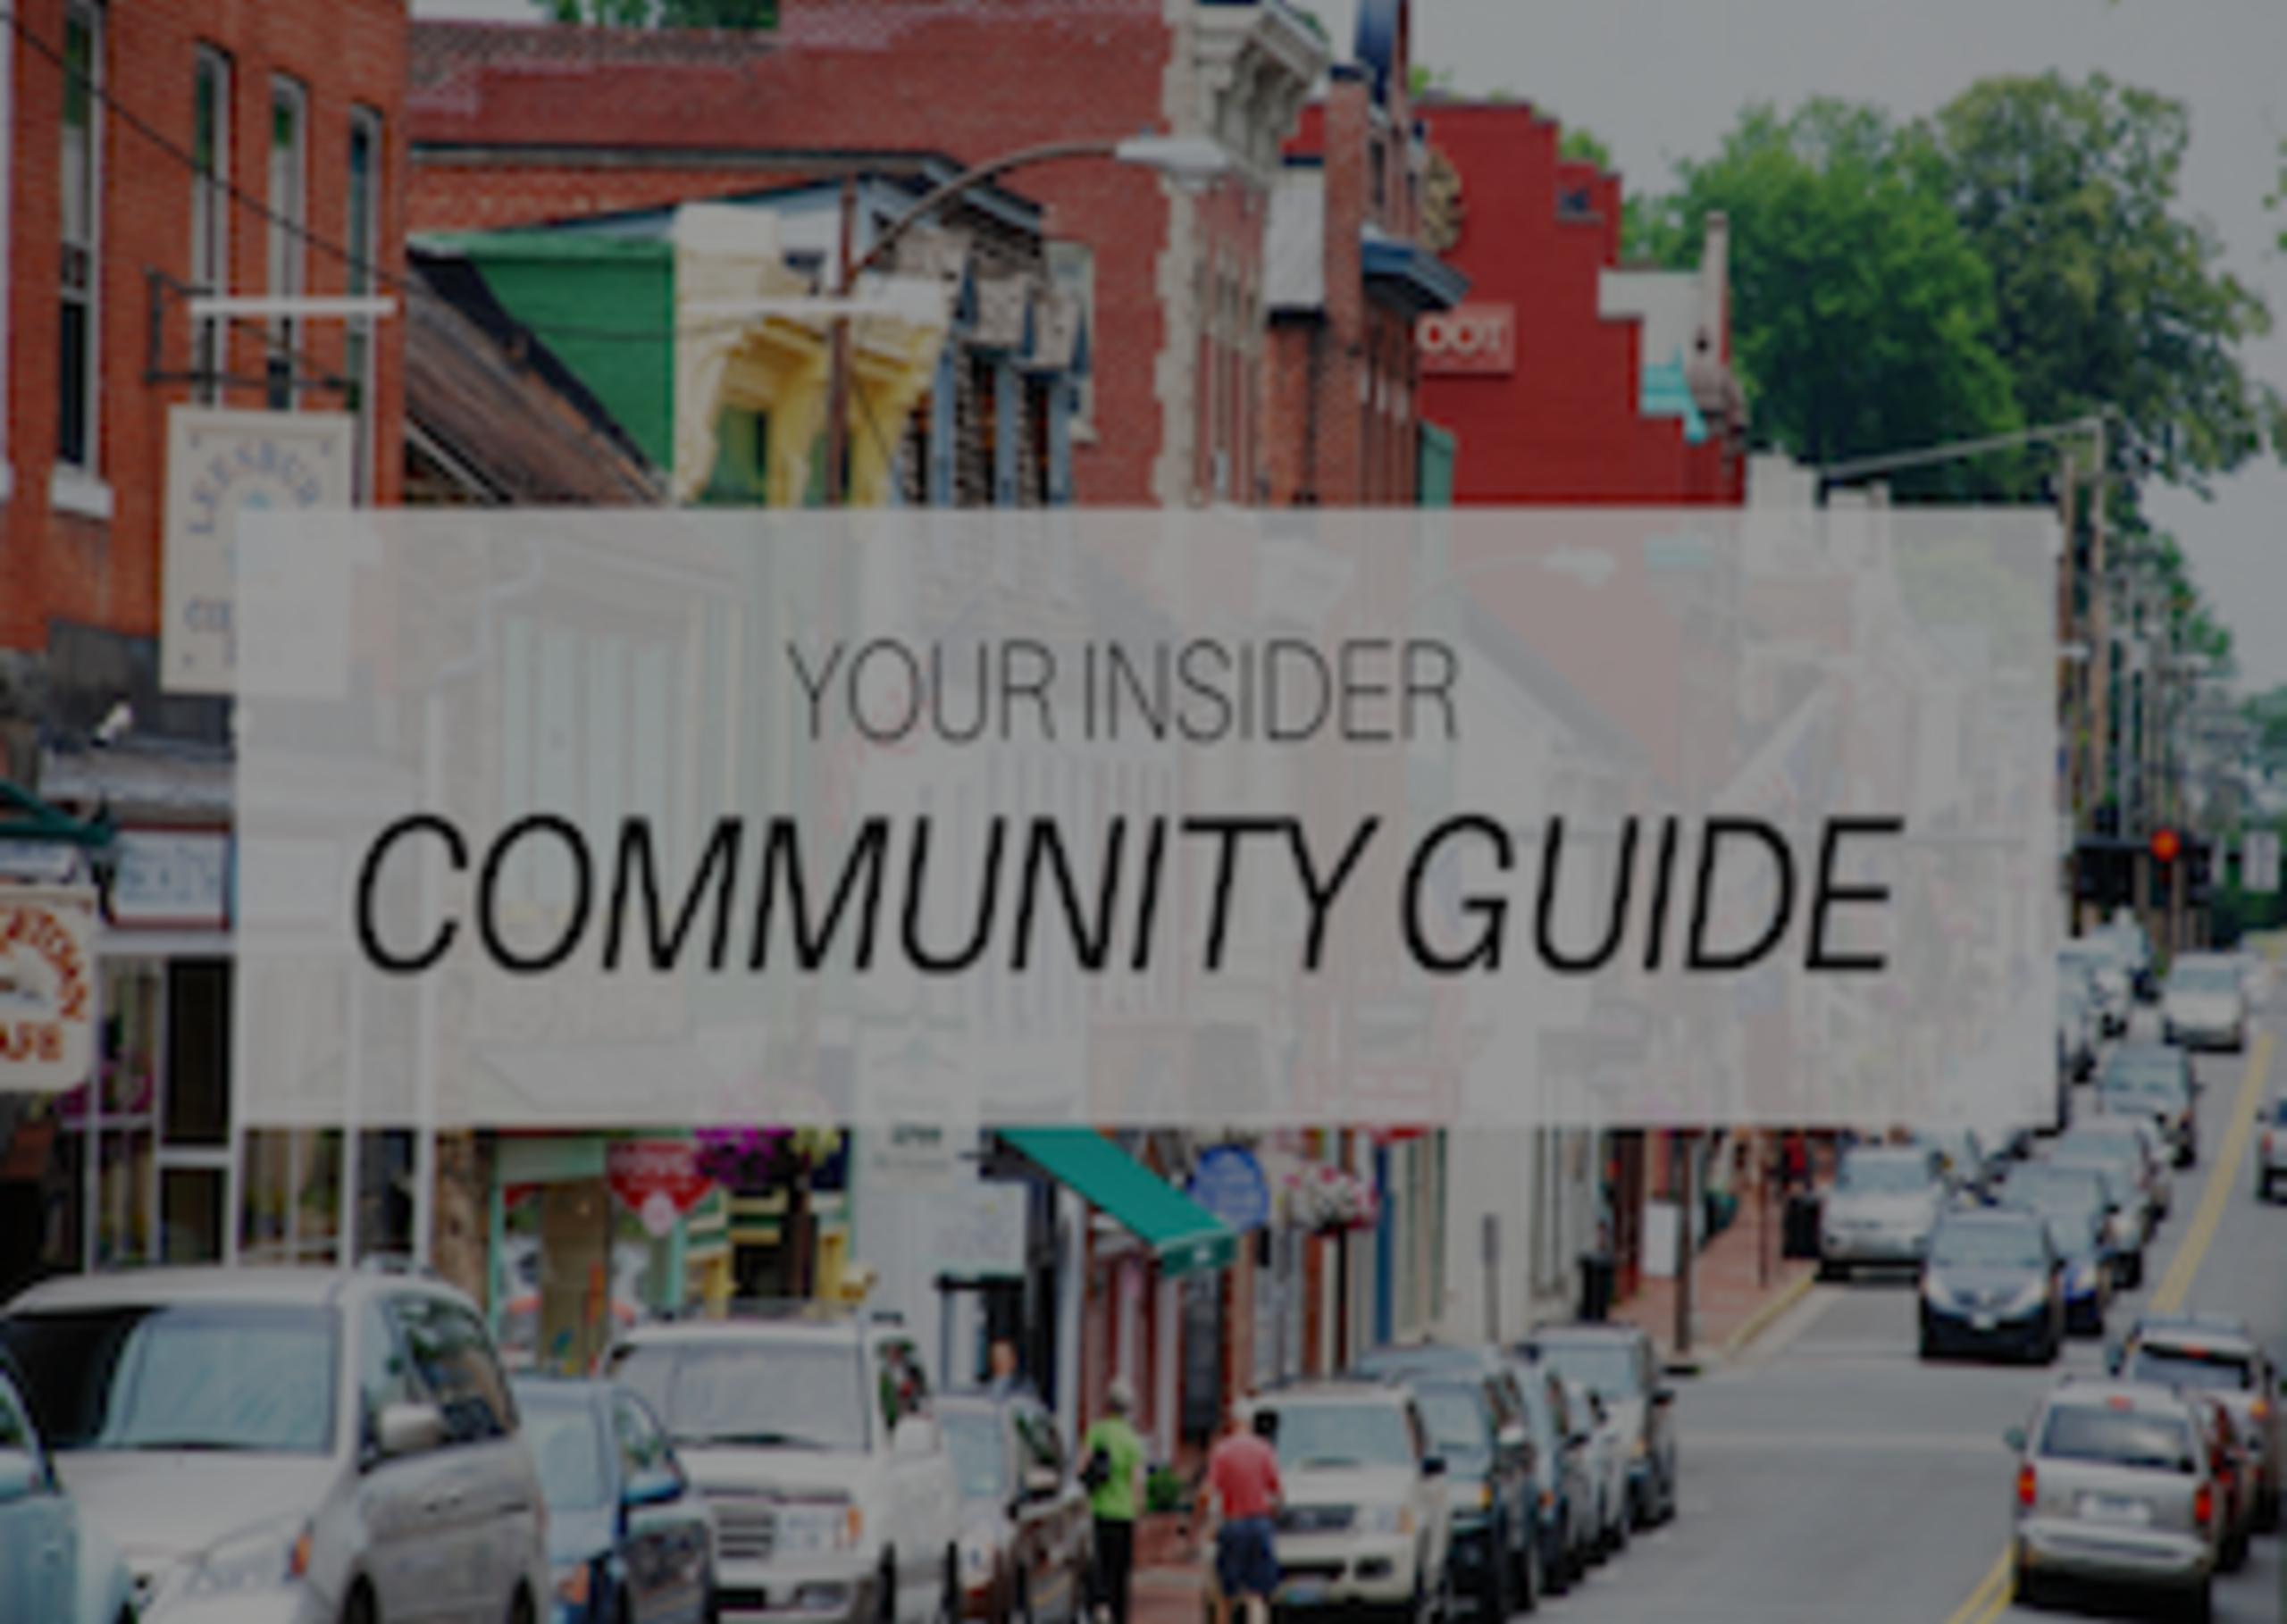 Your Insider Community Guide: Loudoun & Beyond